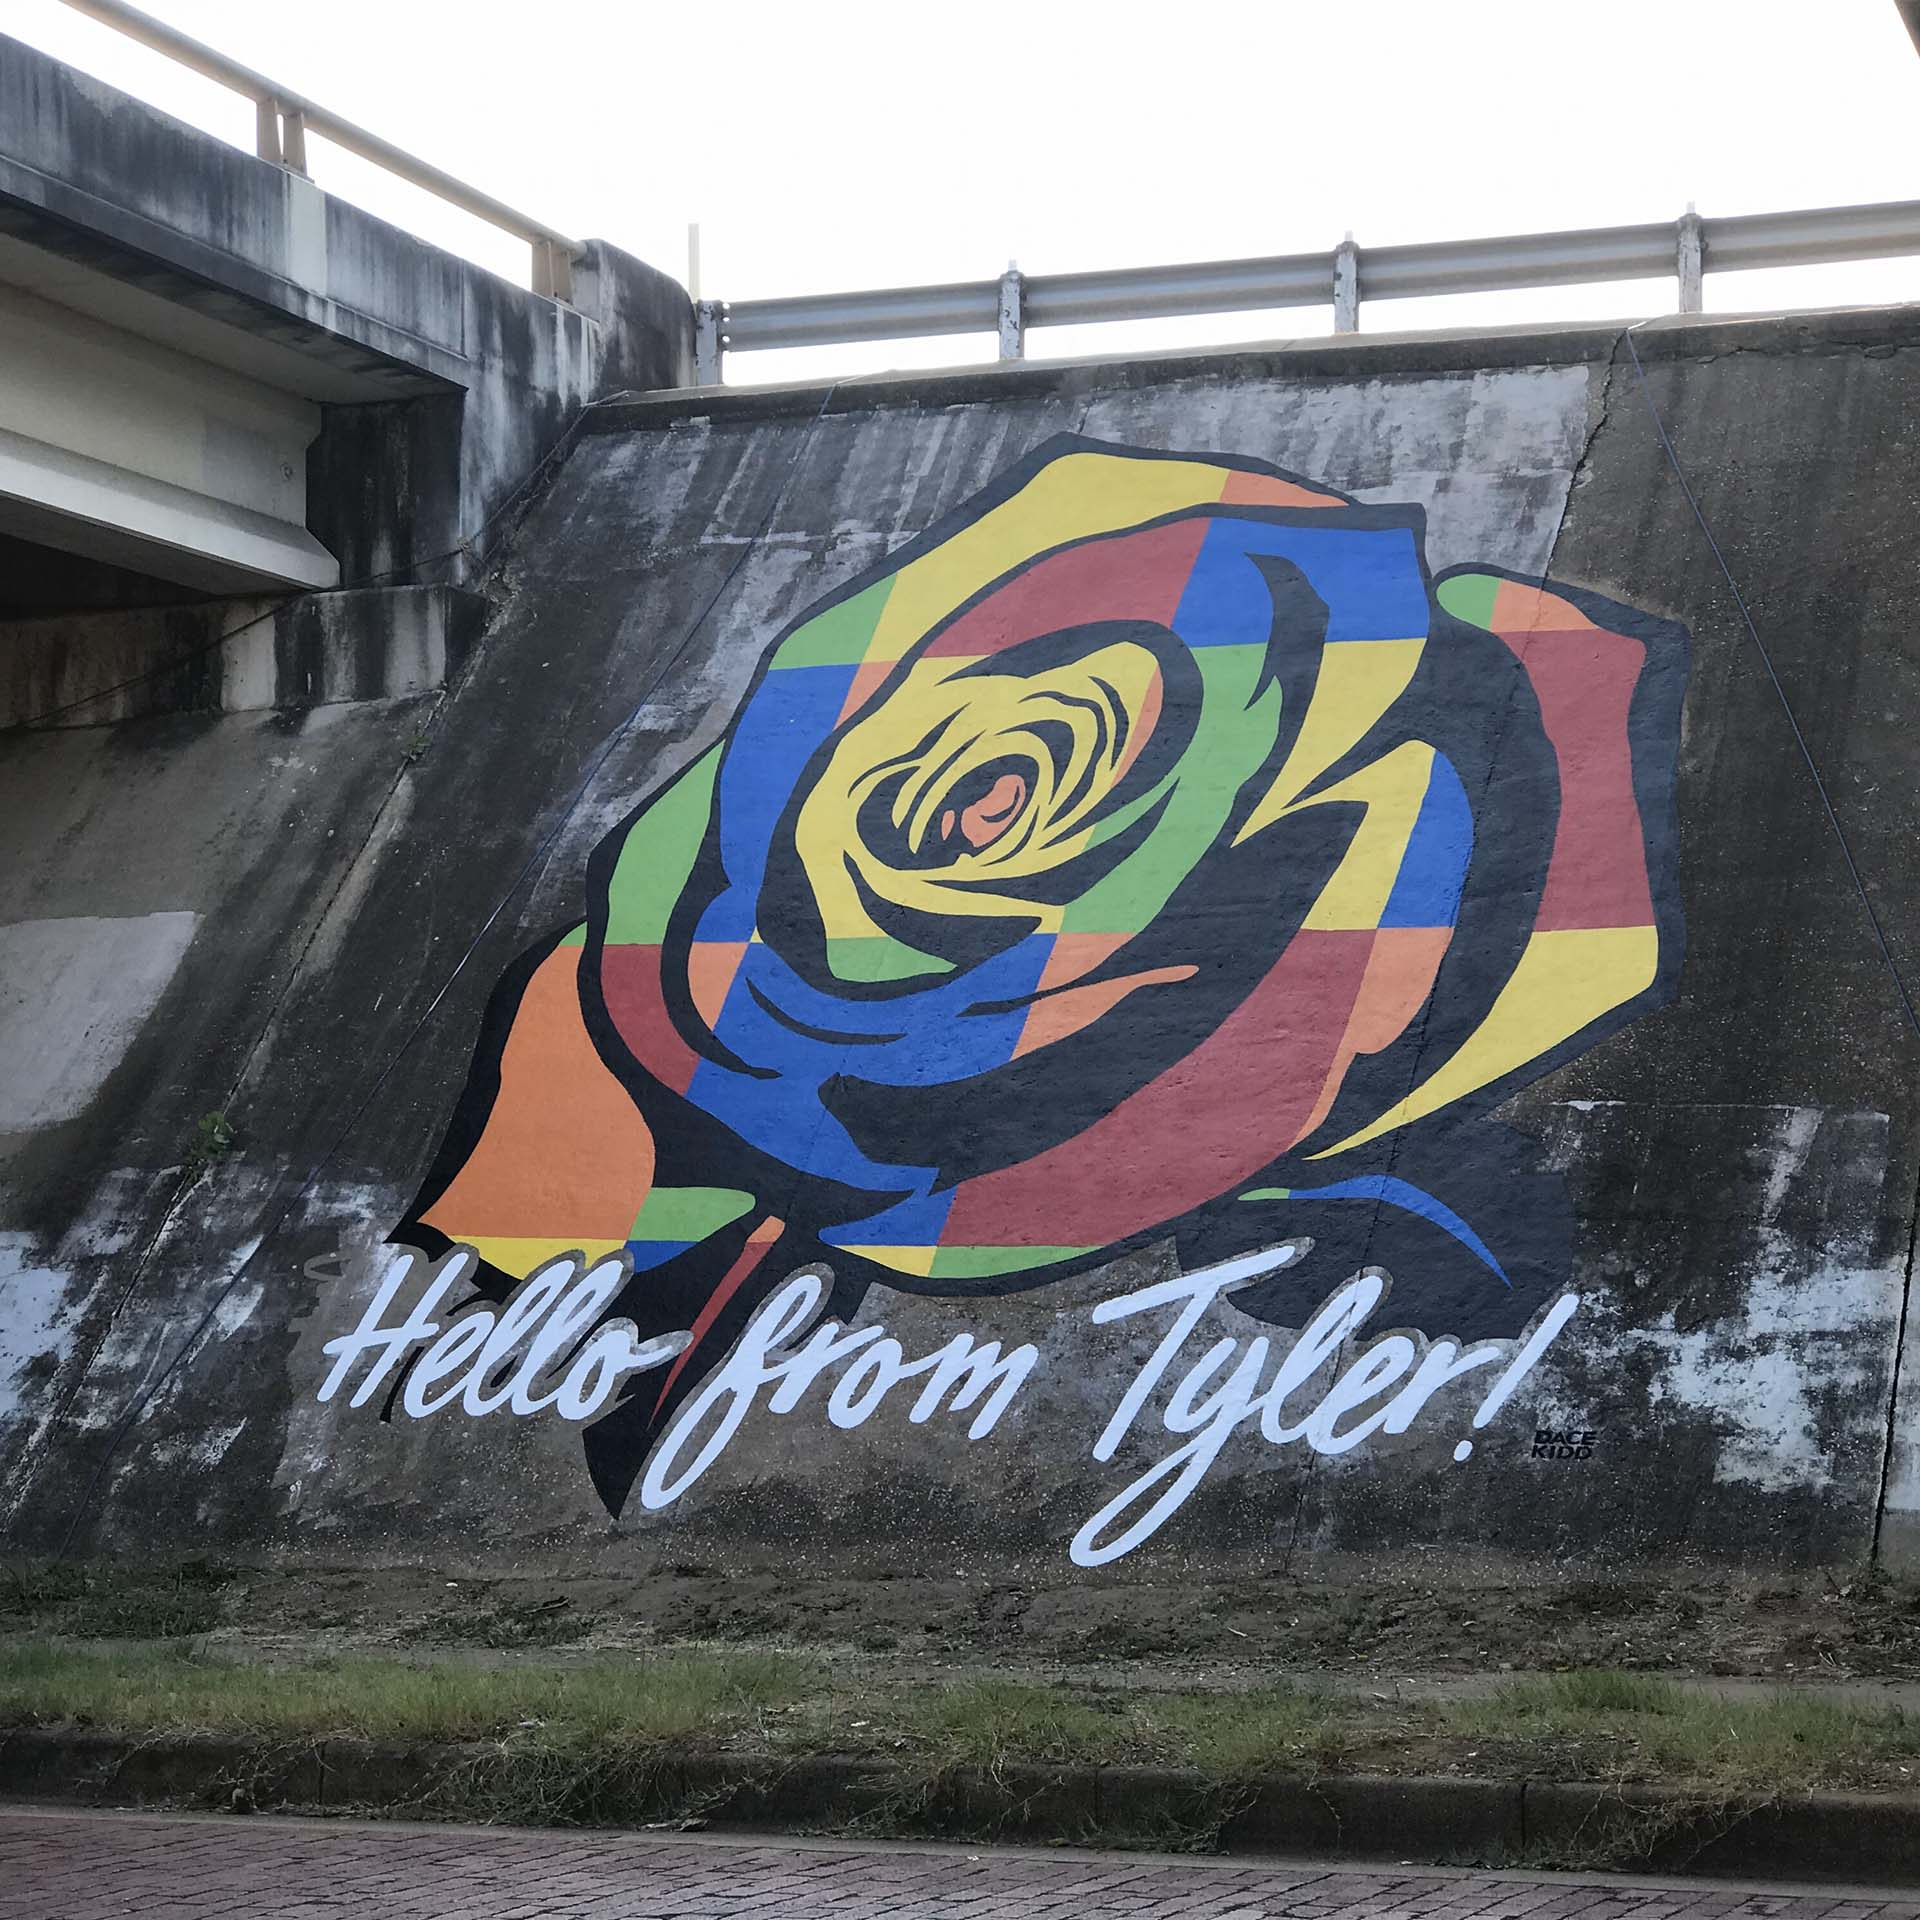 Hello I love you - rose - lettering mural - Dace Kidd - Mural Artist Tx- window painting - Dace Kidd - Mural Artist Tx